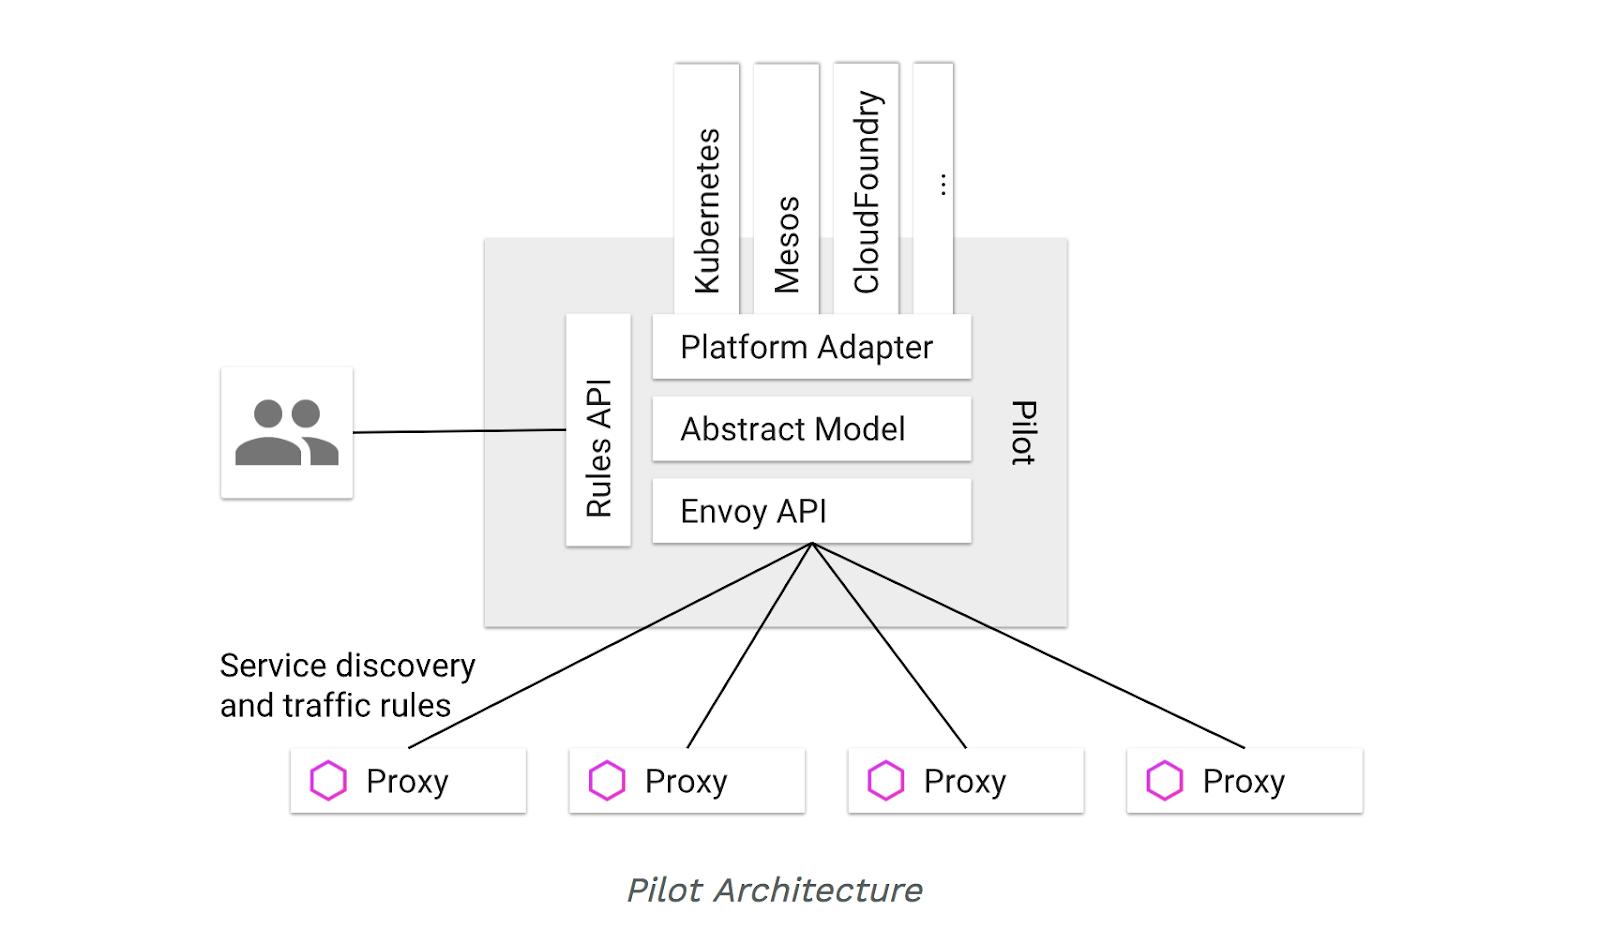 Pilot architecture